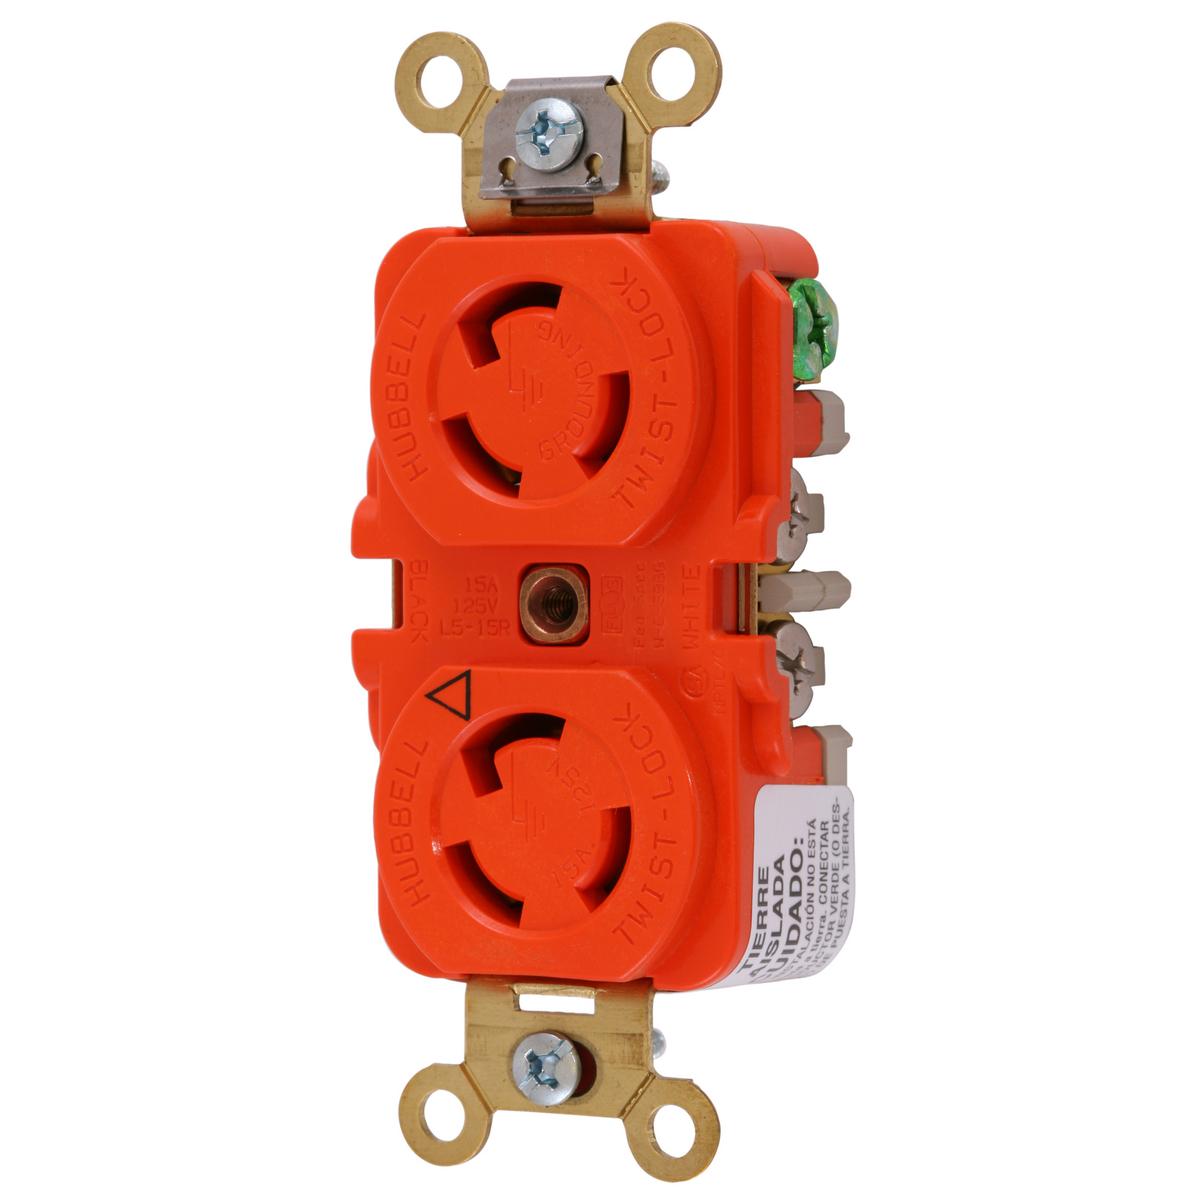 Hubbell IG4700A 15 Amp 125 Volt 2-Pole 3-Wire NEMA L5-15R Orange Isolated Ground Locking Duplex Receptacle